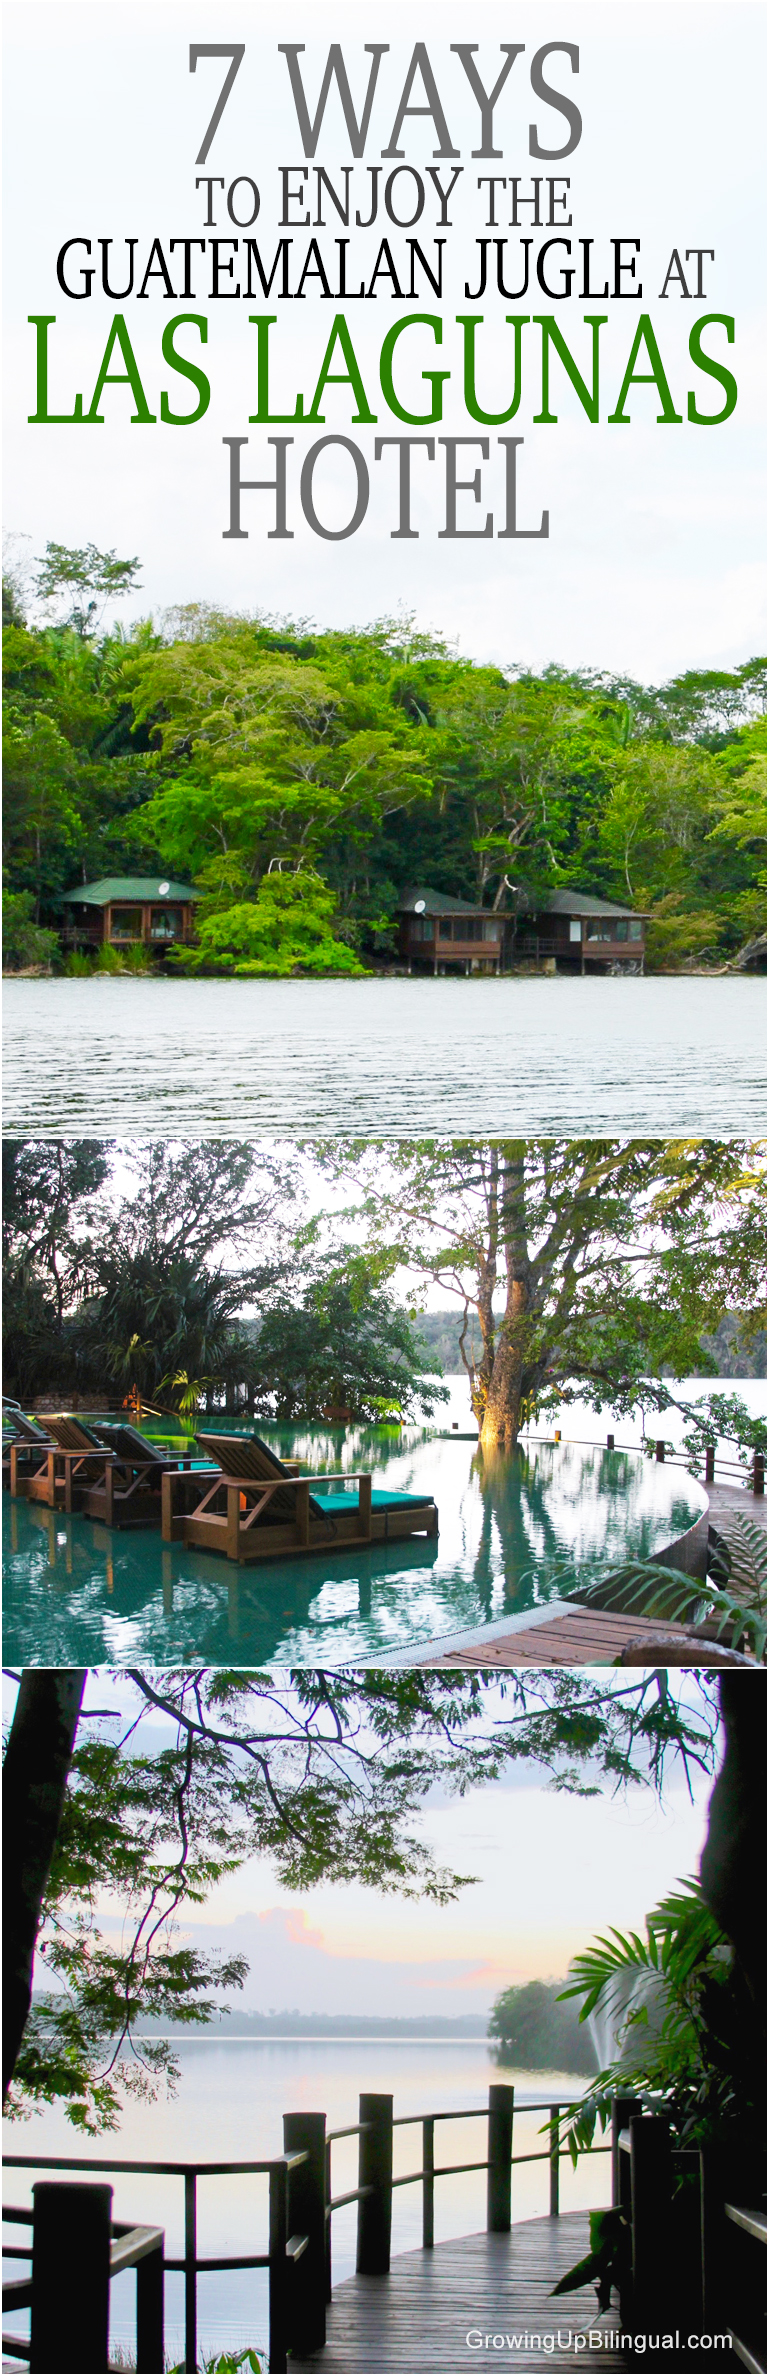 7 Ways To Enjoy The Guatemalan Jungle At Las Lagunas Hotel